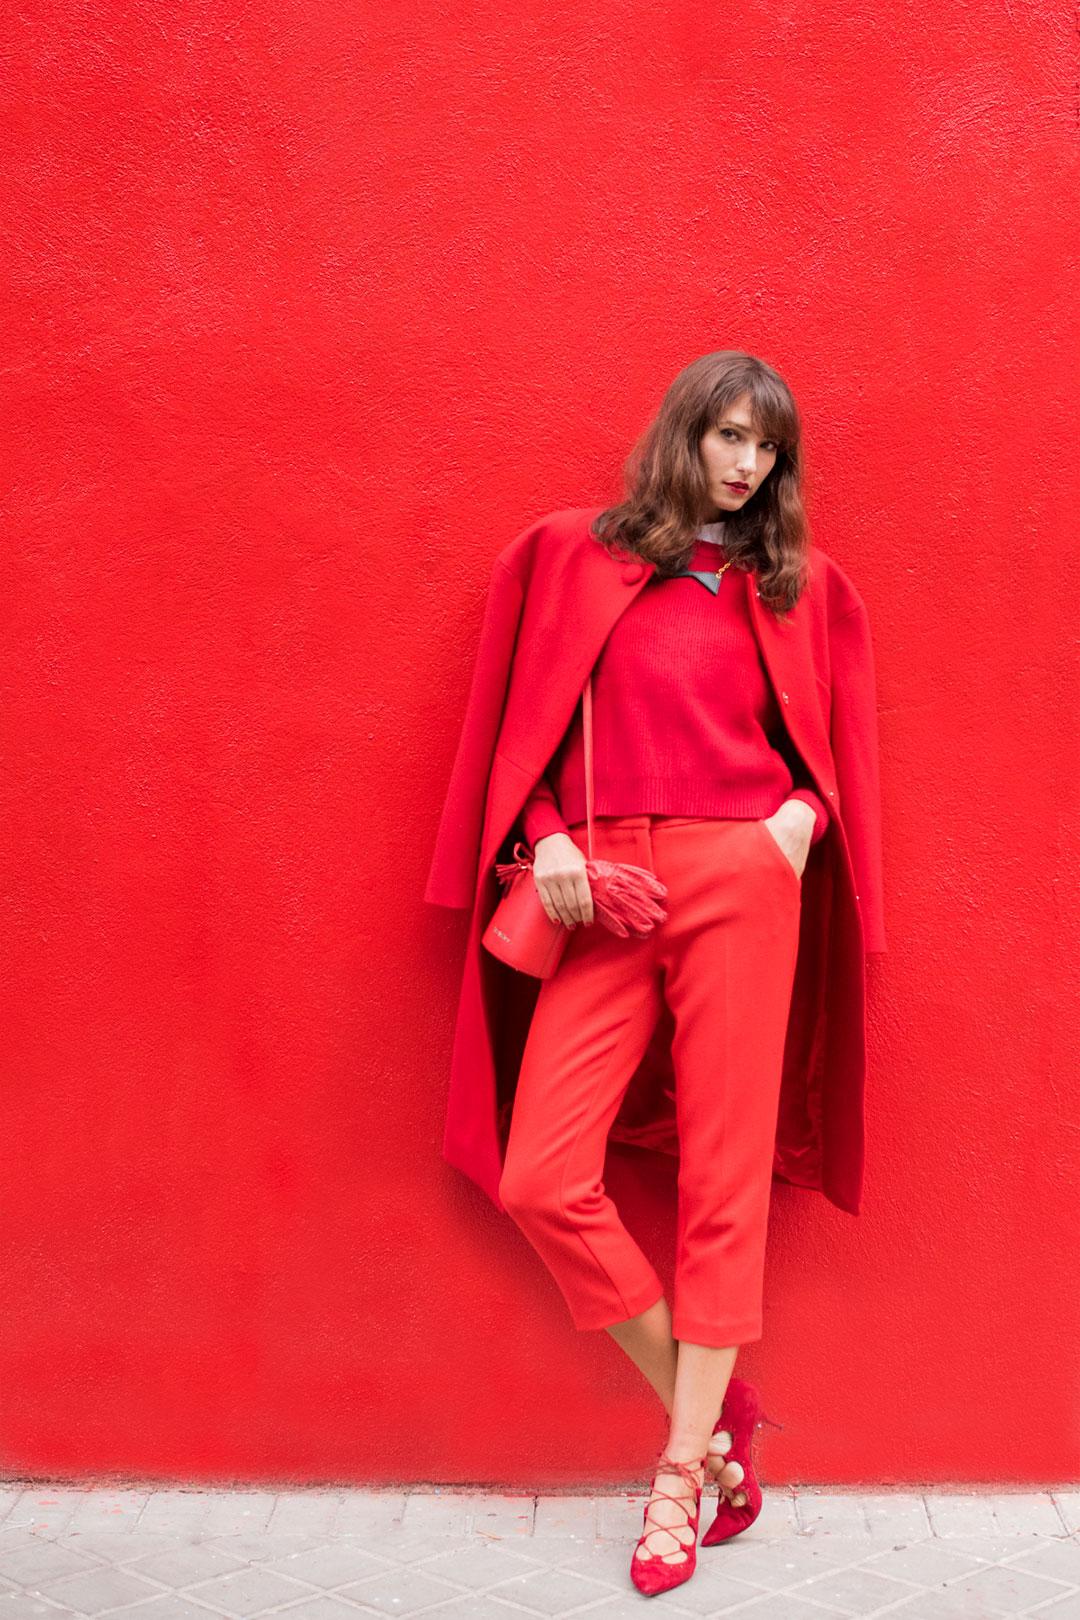 red-bow-tie-guerlain-streetstyle-mitmeblog-web-05